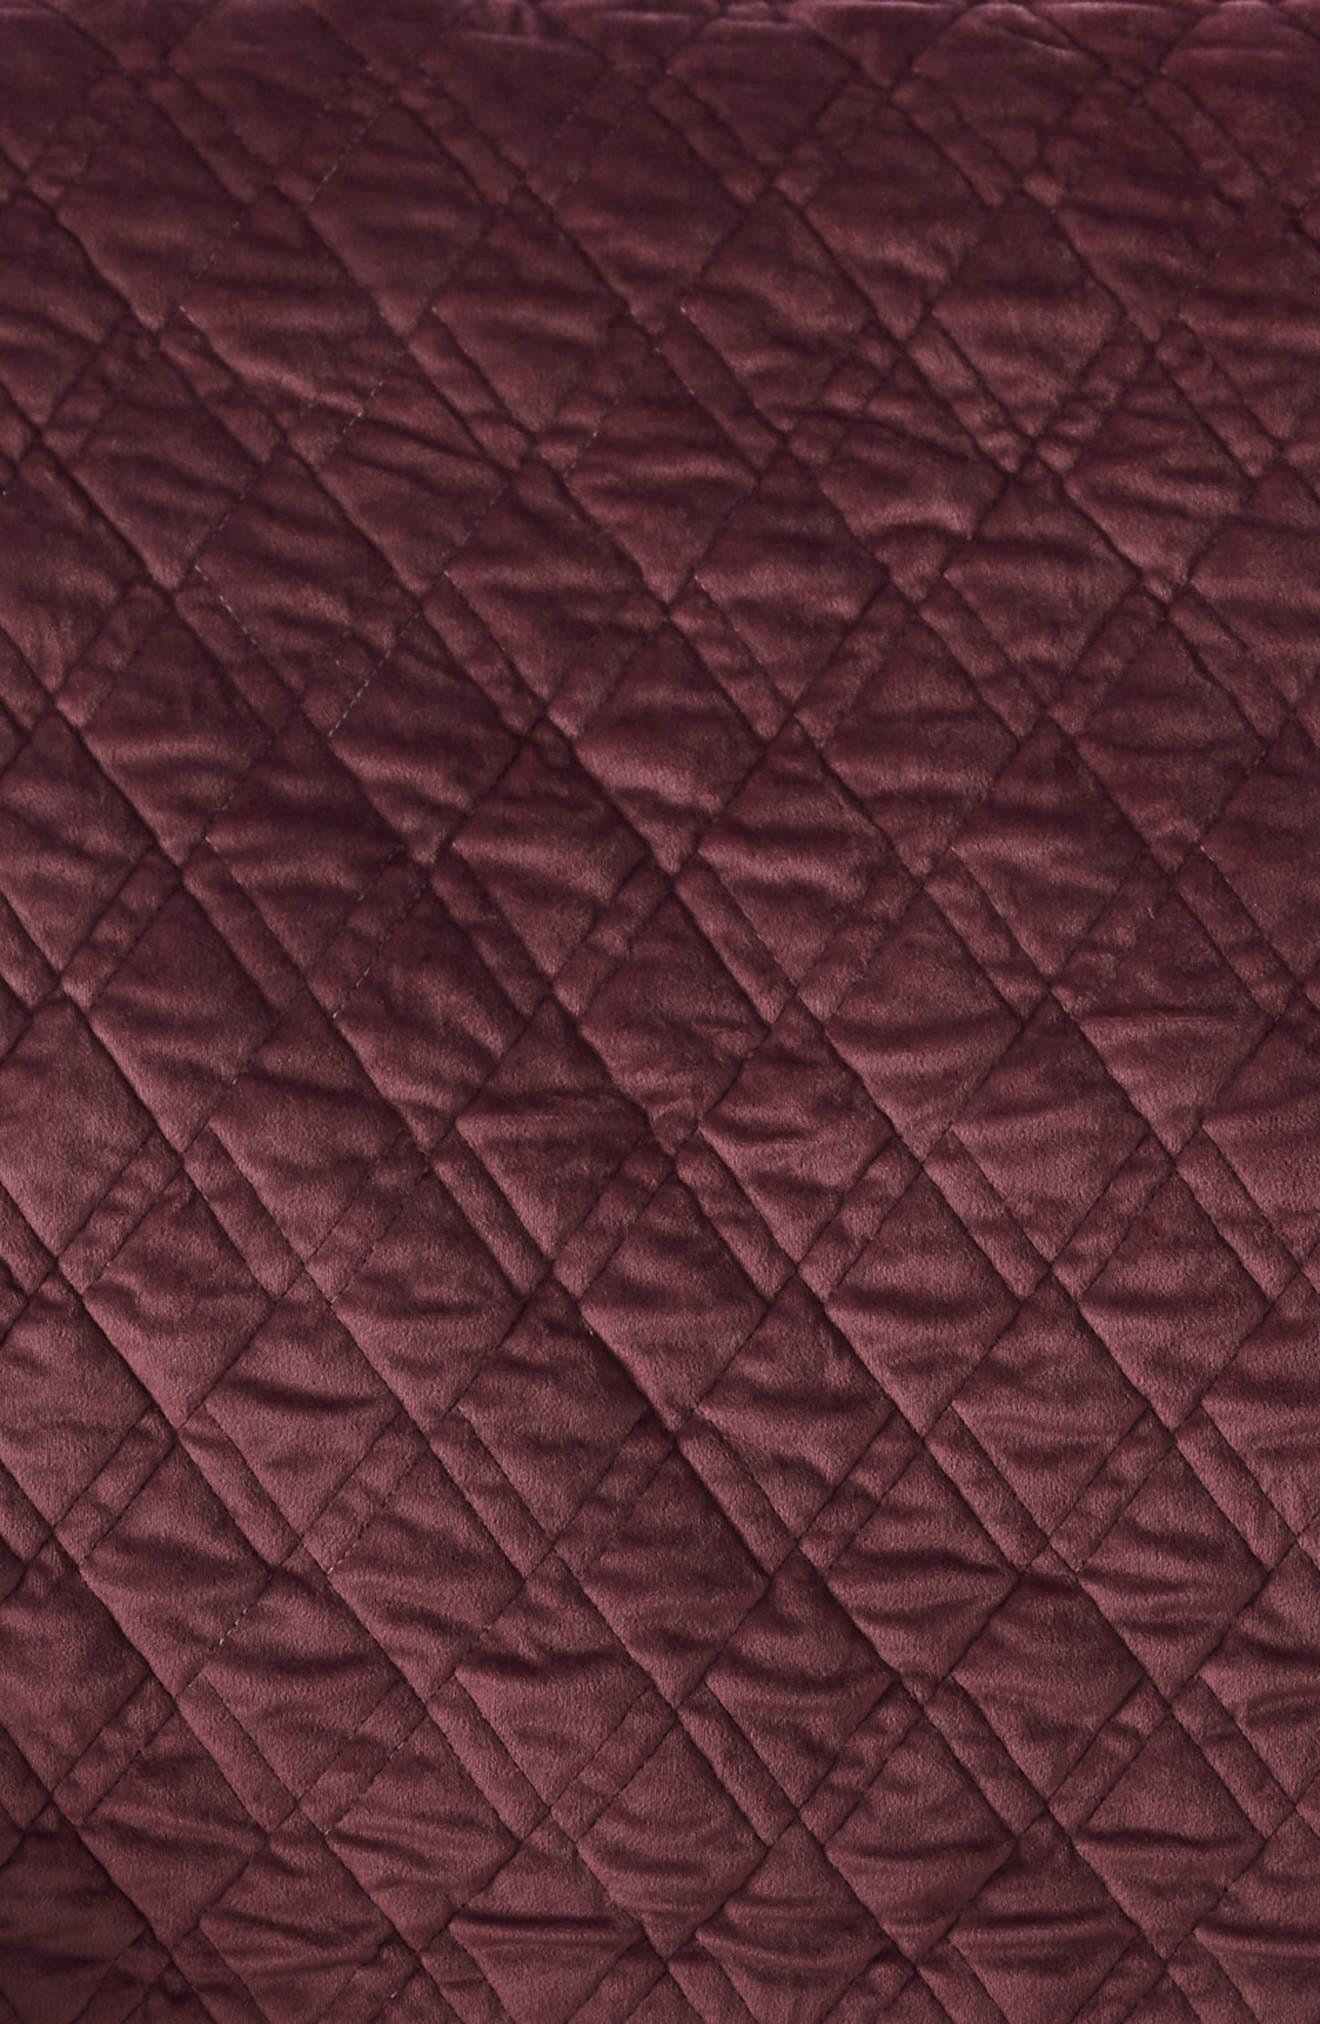 Karlina Geometric Quilt,                             Alternate thumbnail 2, color,                             BURGUNDY STEM